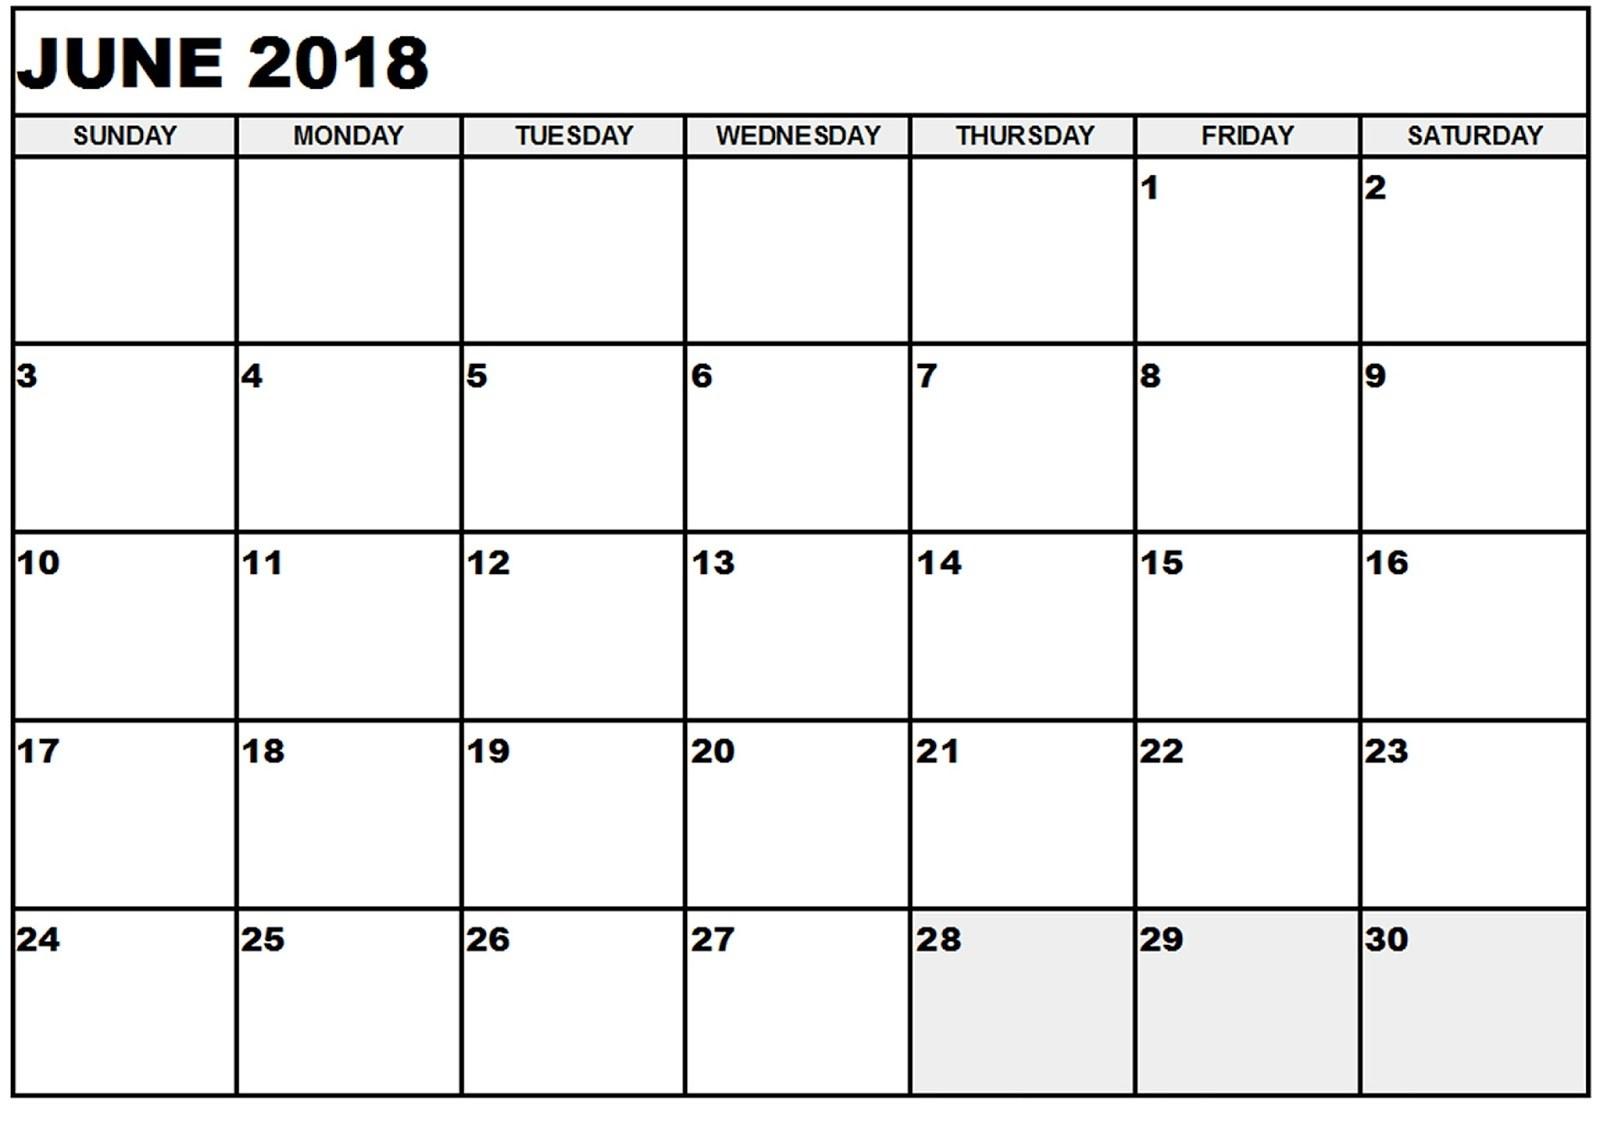 Free June 2018 Calendar Printable Blank Templates - Word Pdf in June Calendar Printable Template